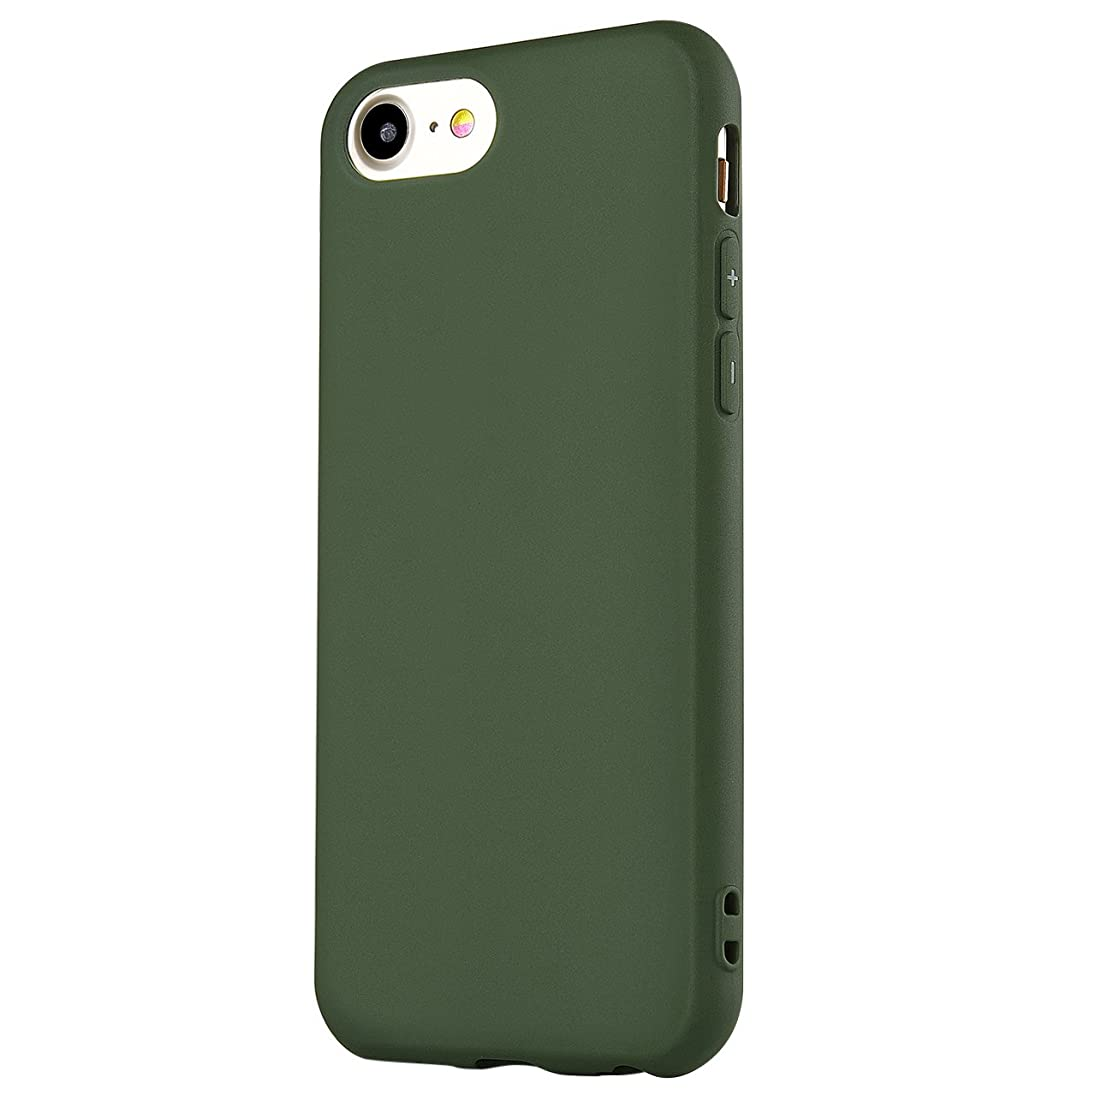 Manleno iPhone 7 Case, iPhone 8 Case Soft TPU Matte Cover Case for iPhone 7/8 4.7 Inch (Matte Dark Green)